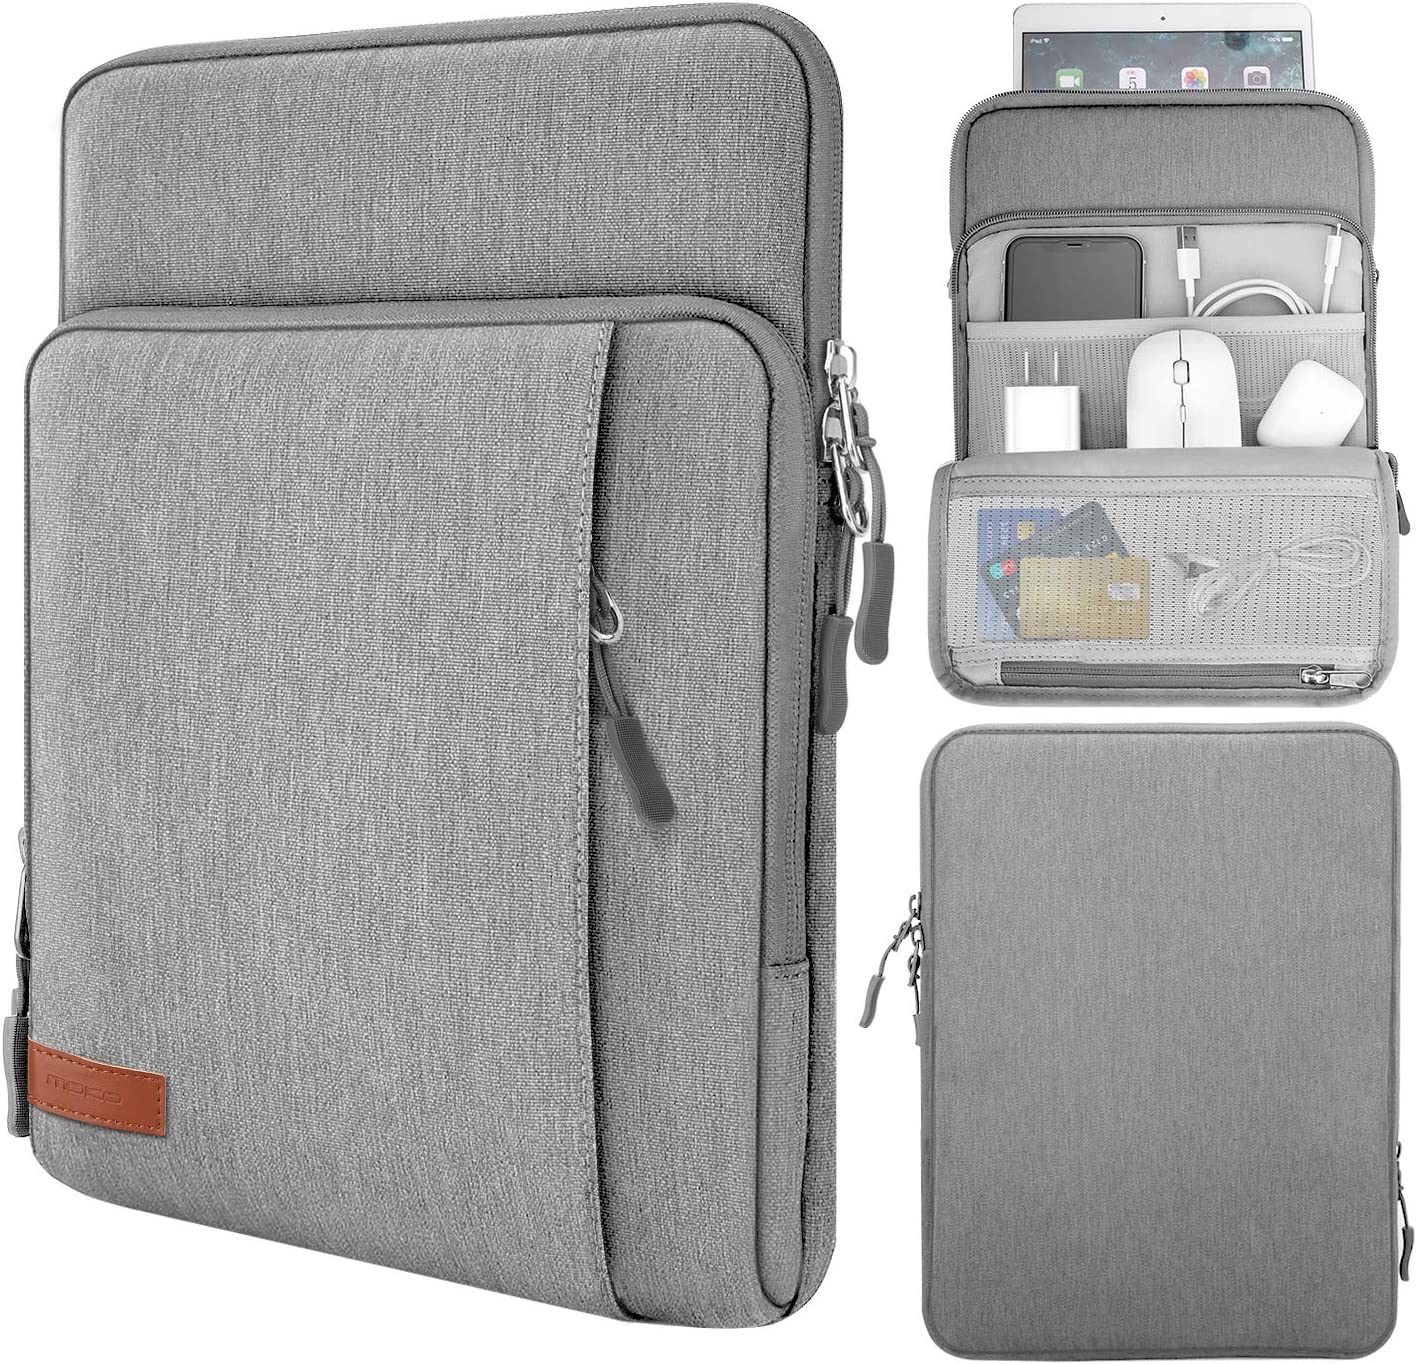 MoKo 9-11 Inch Tablet Sleeve Bag Carrying Case with Storage Pockets Fits iPad Pro 11, iPad 8th 7th Generation 10.2, iPad Air 4 10.9, Air 3 10.5, iPad 9.7, Galaxy Tab A 10.1, S6 Lite, S7 - Light Gray